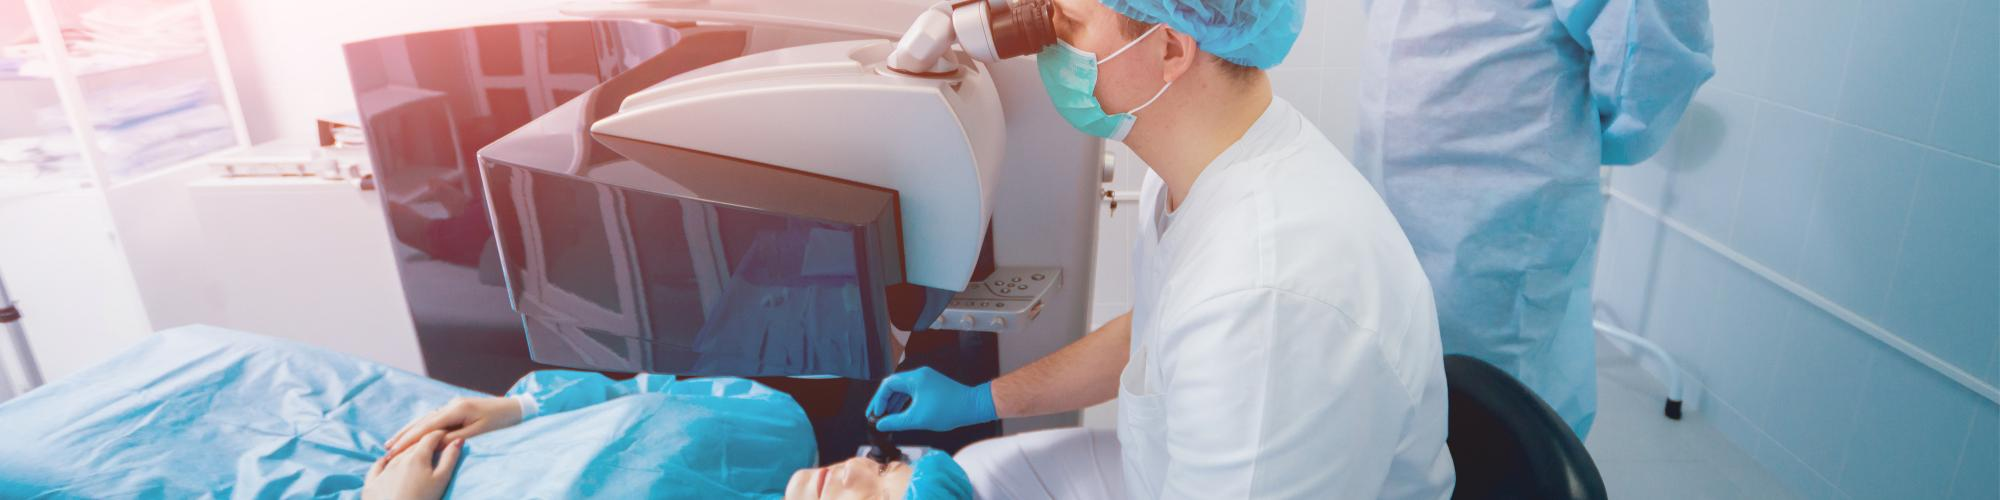 Lasermed Augenarzt MVZ GmbH